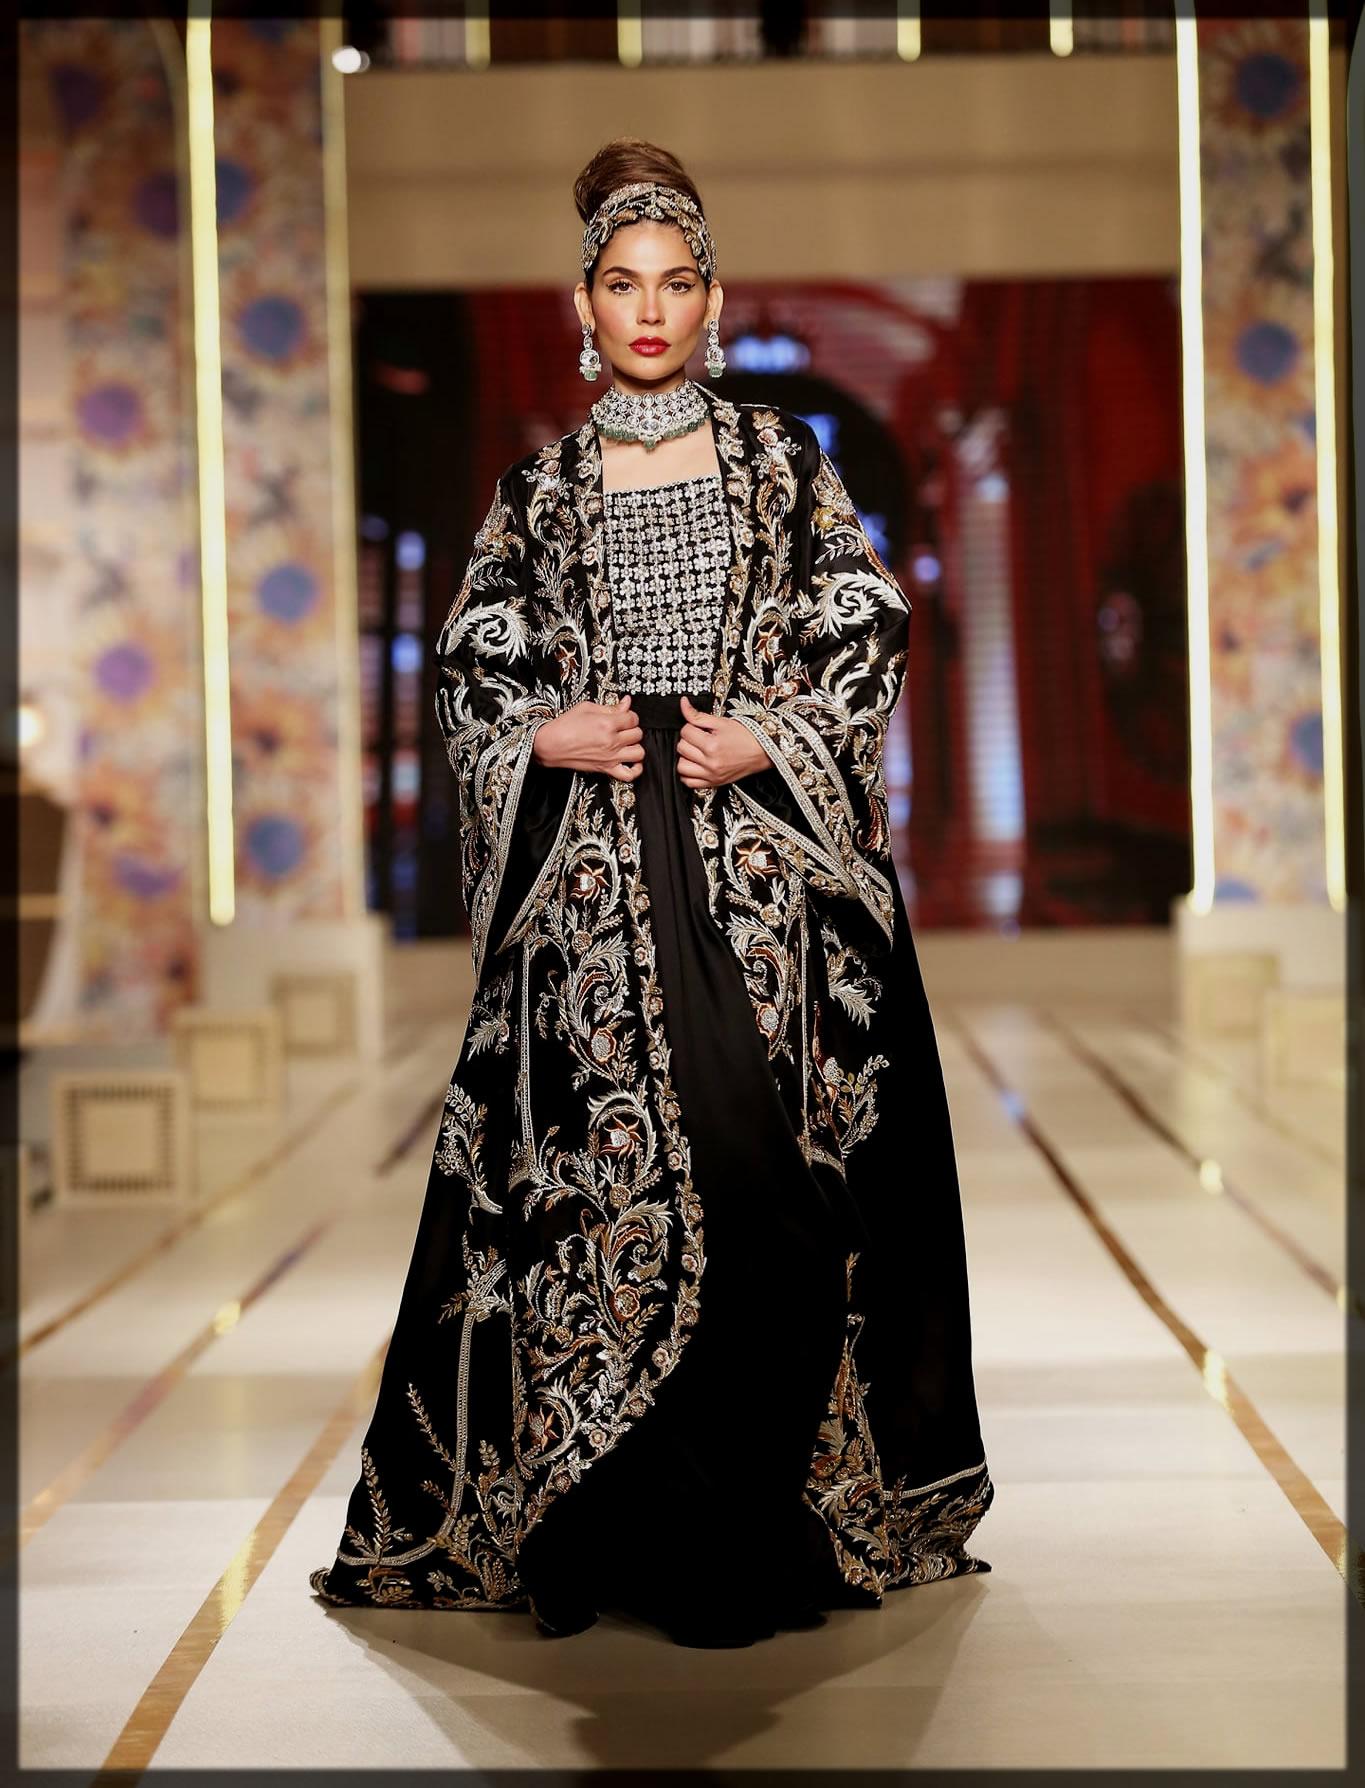 dazzling black Sable vogue dress for women